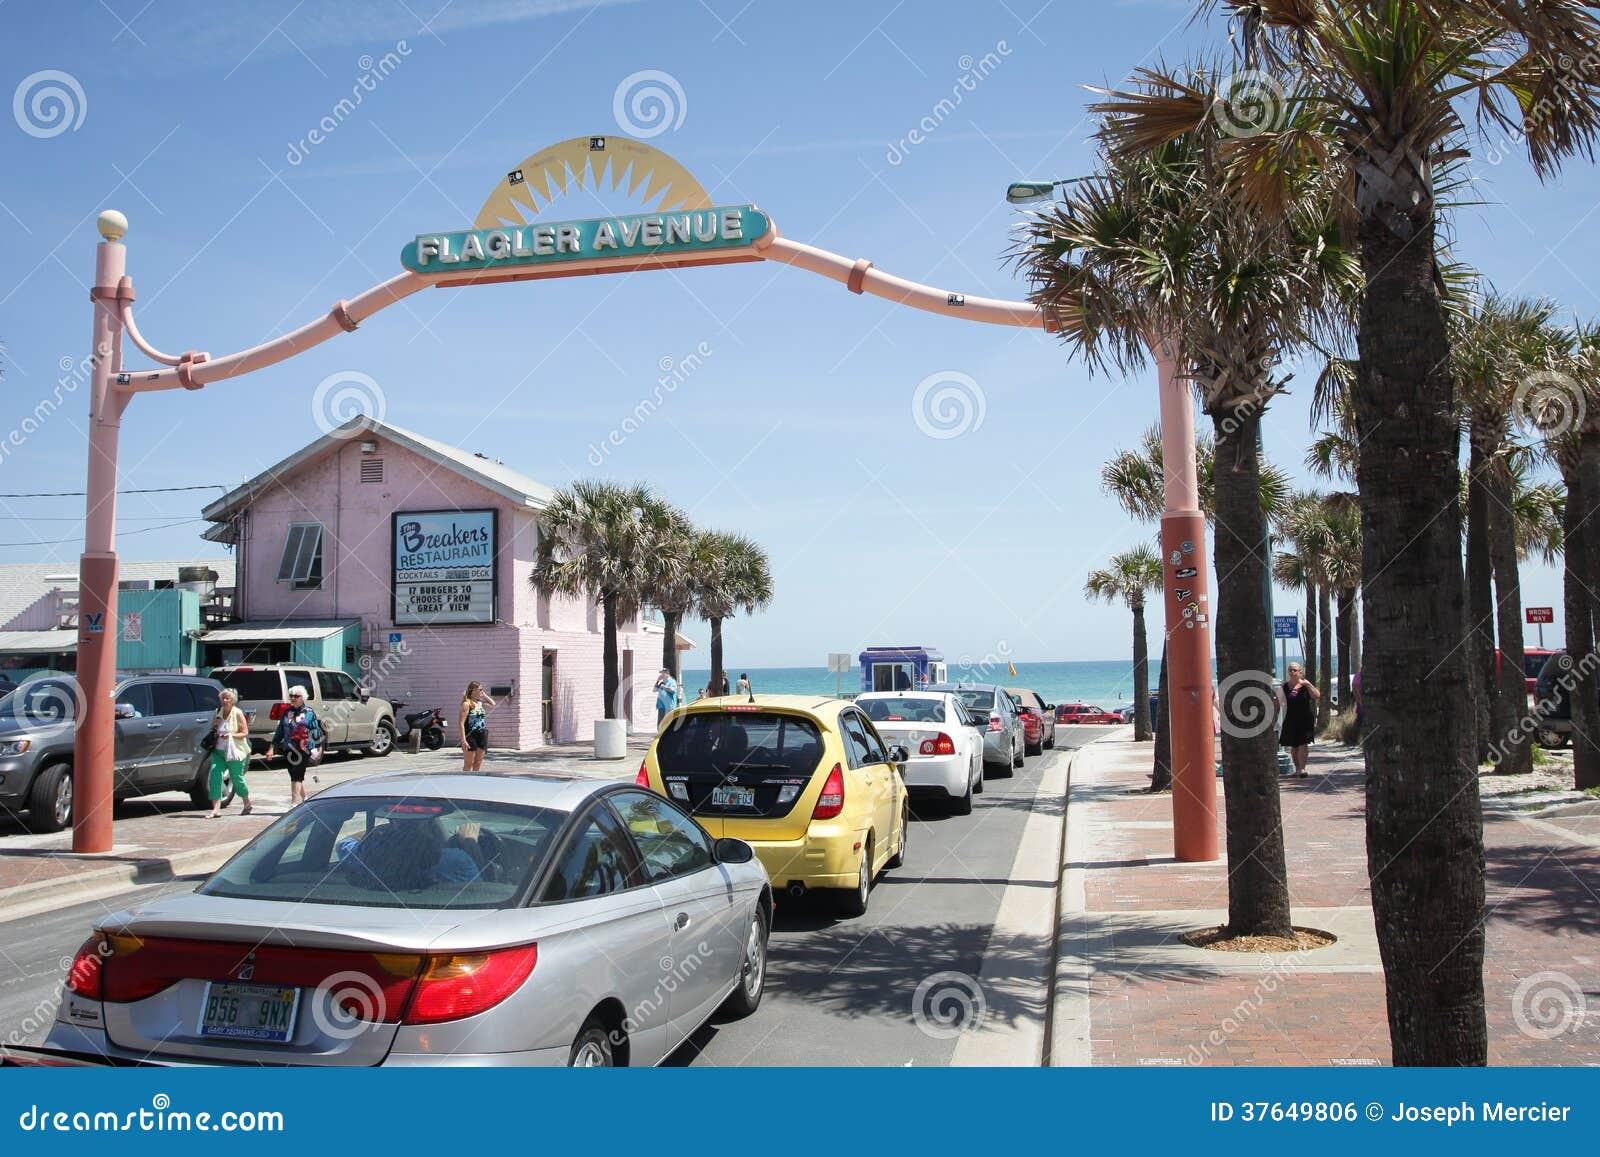 HET STRAND VAN FLORIDA FLAGLER